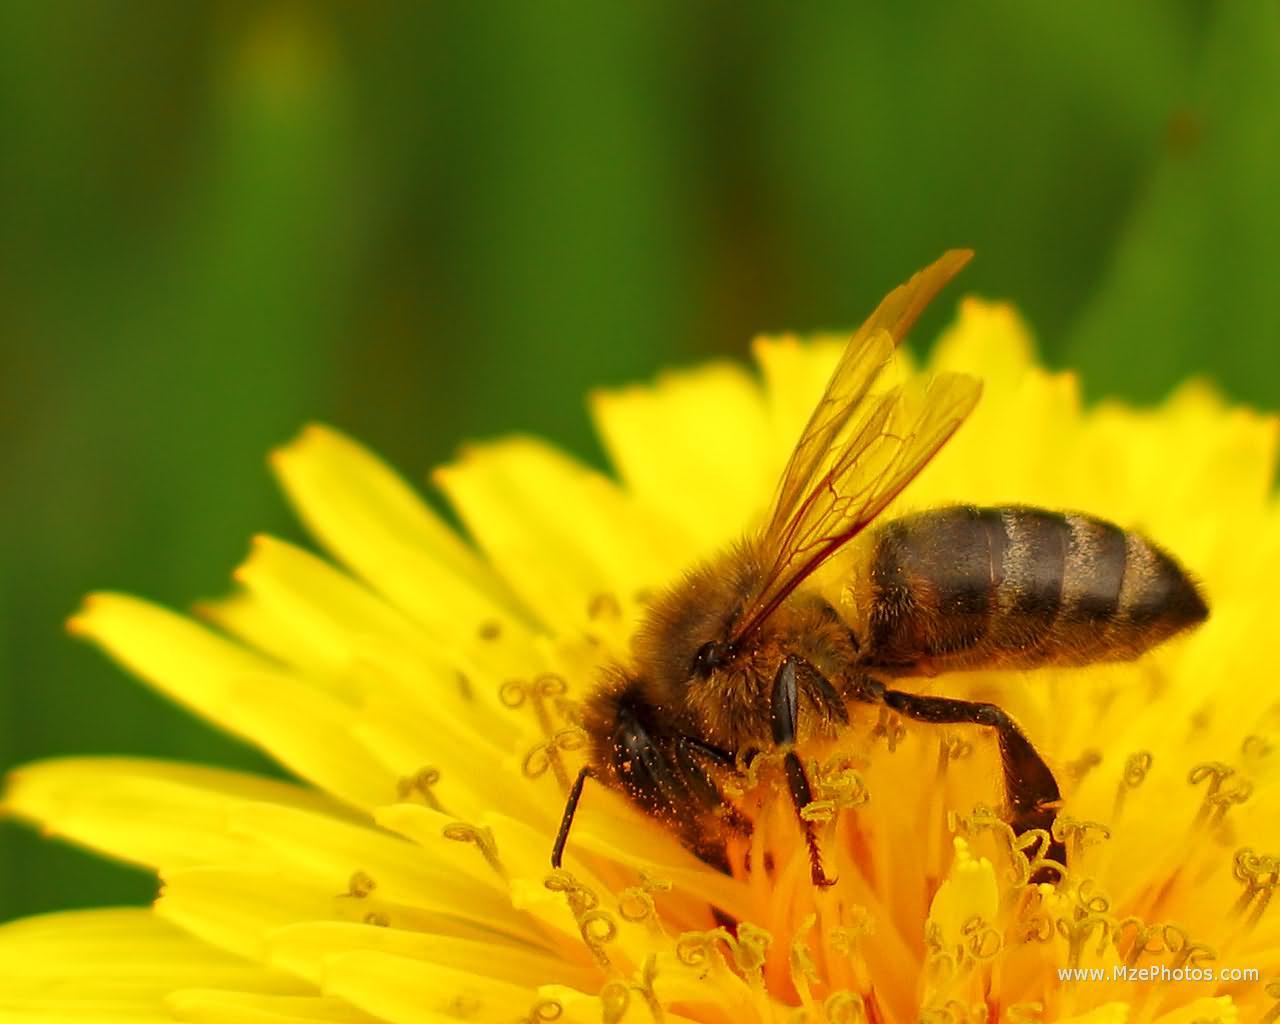 Honey Bee Macro Photo 1280x1024